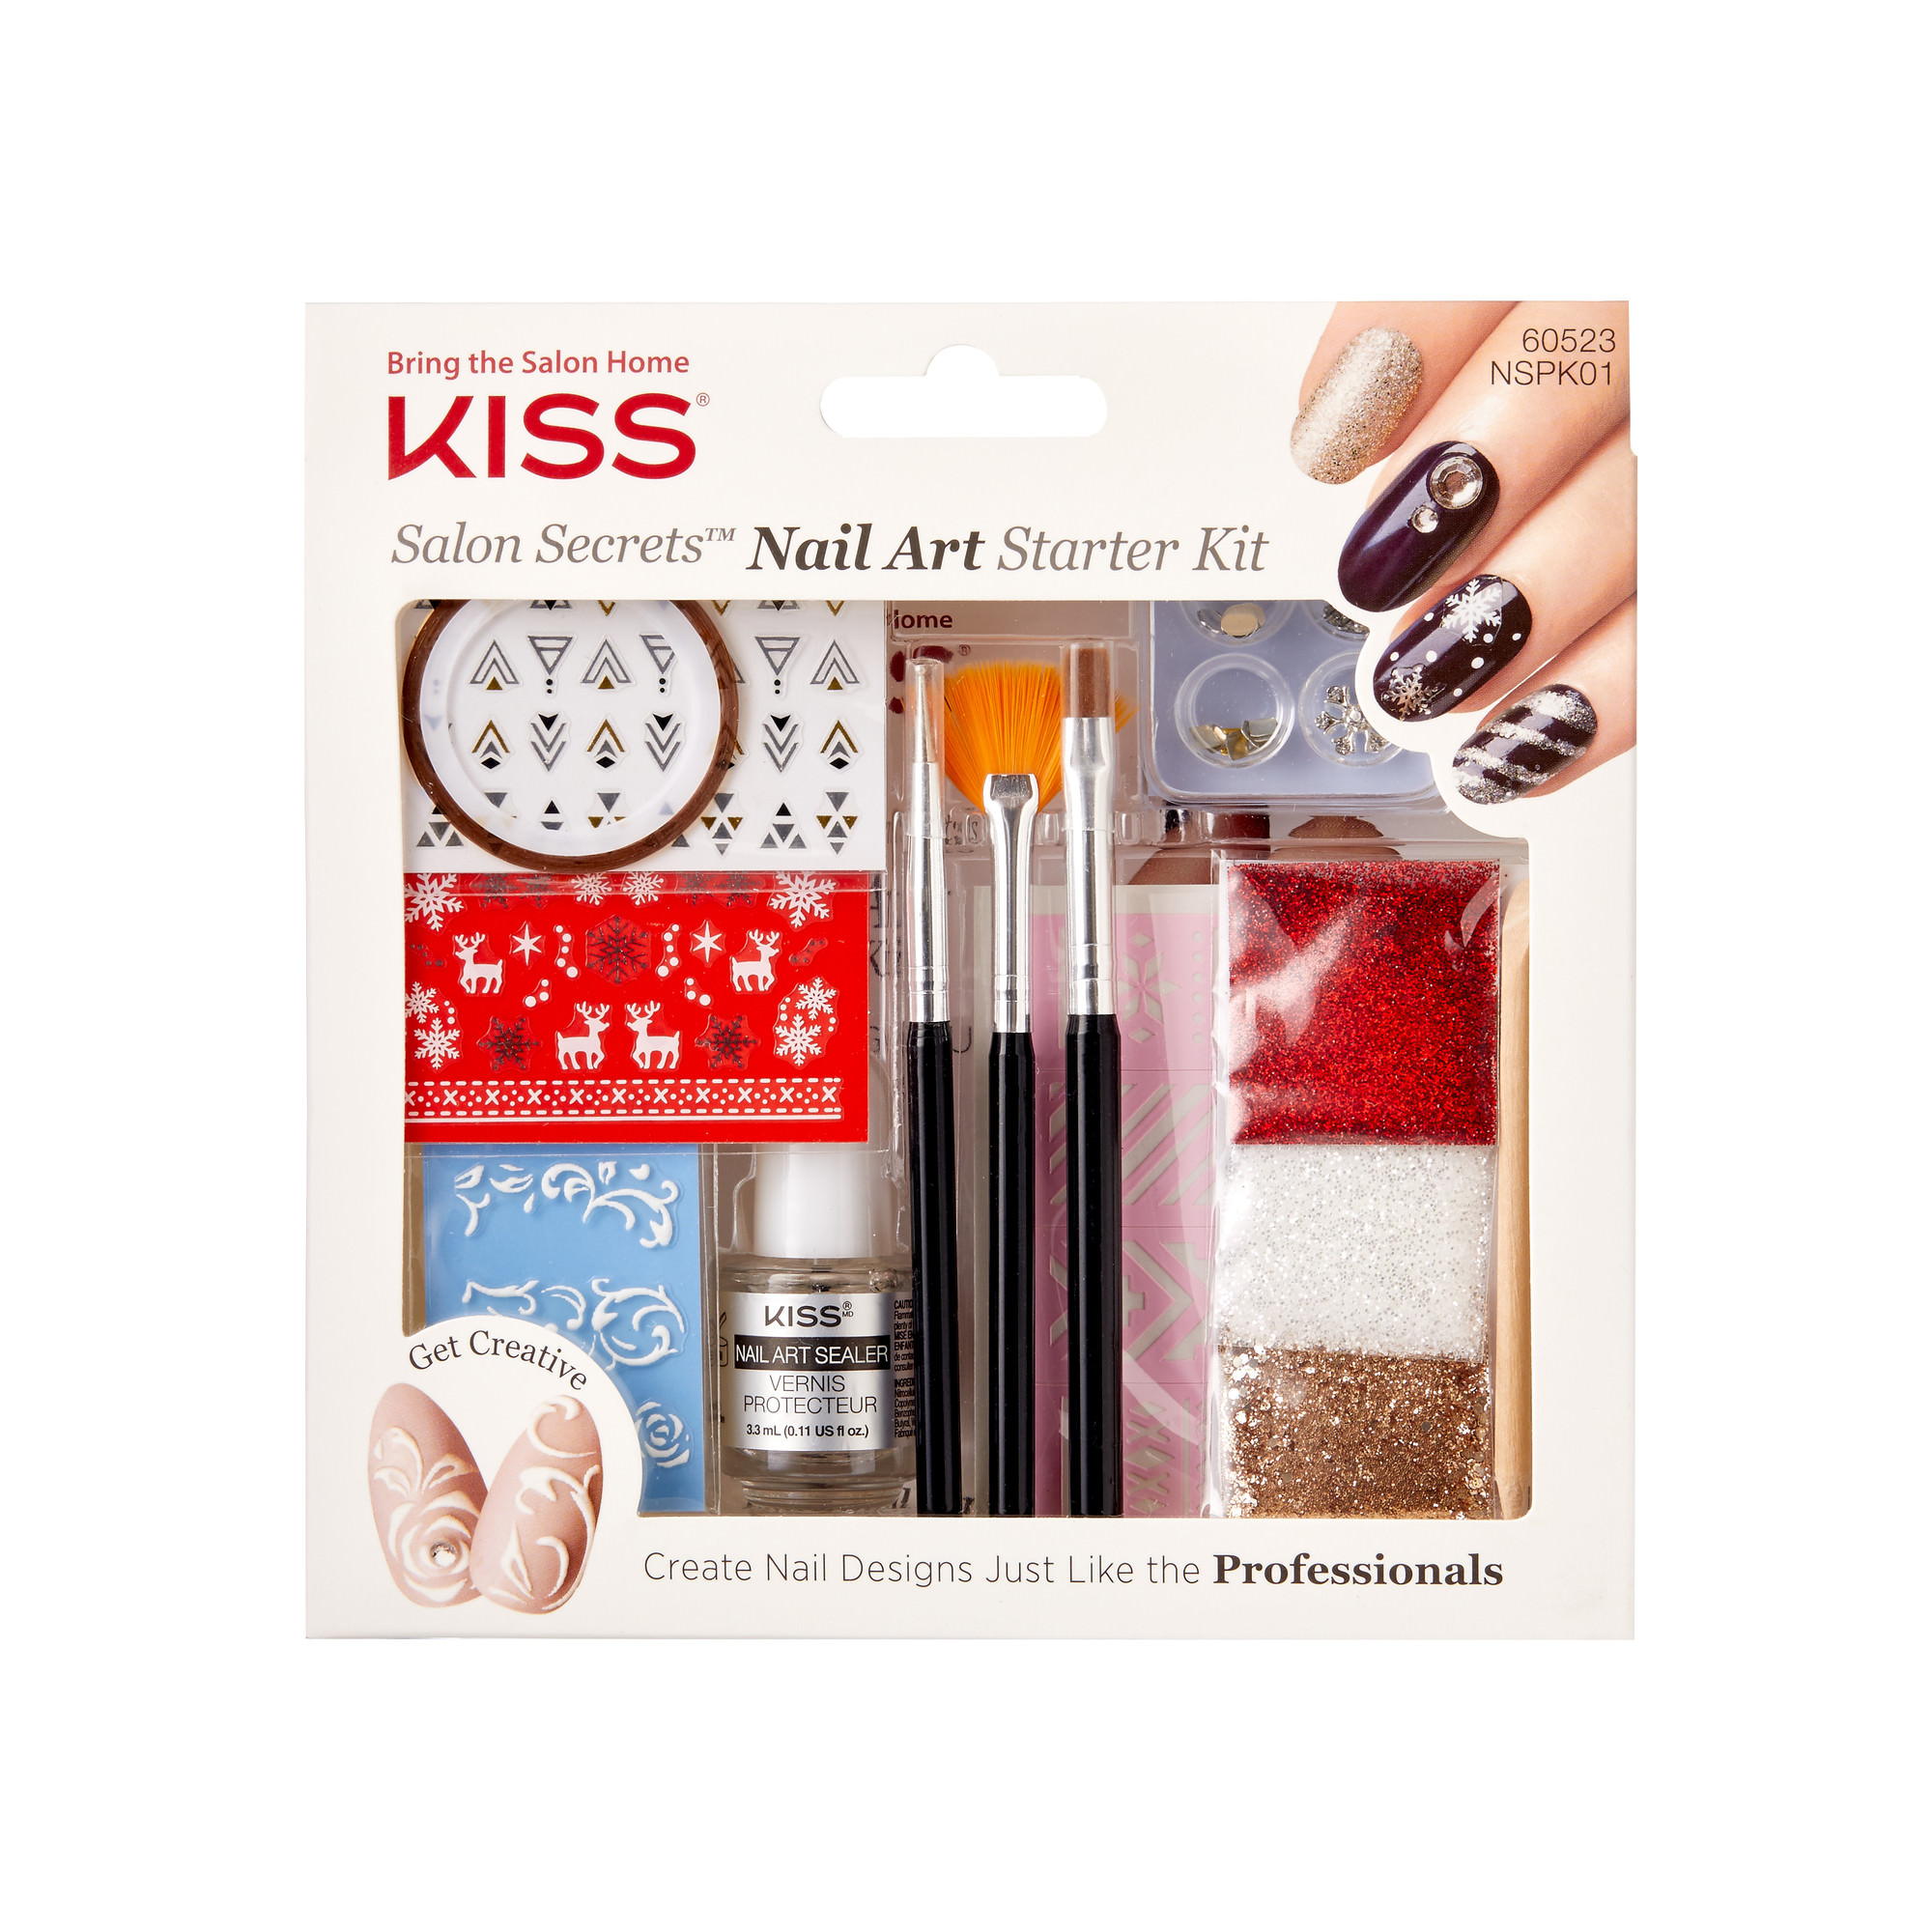 KISS Salon Secrets™ Nail Art Starter Kit - Walmart.com